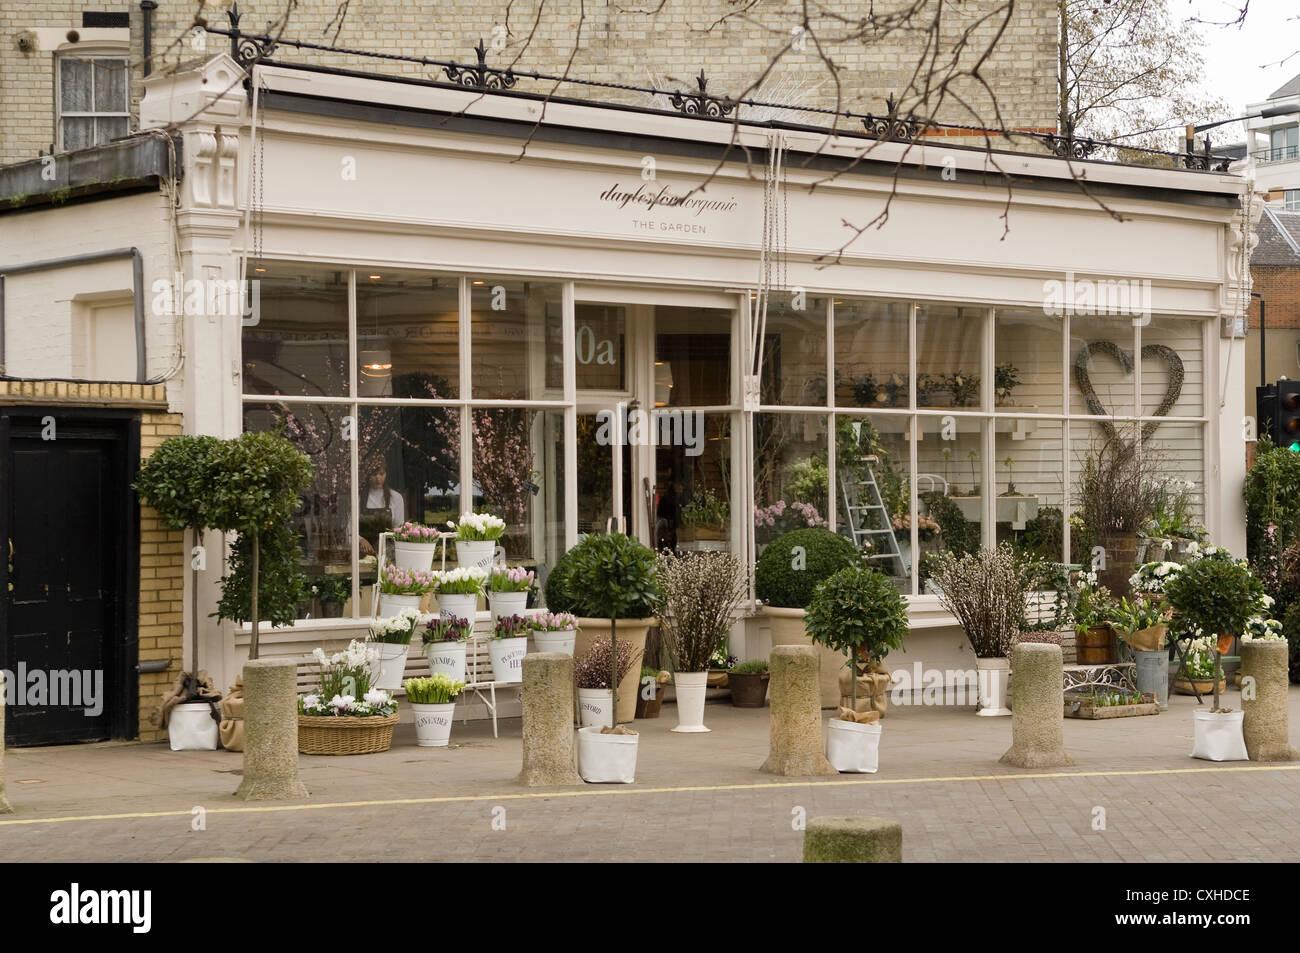 Daylesford Organic florist on London's Pimlico Road - Stock Image